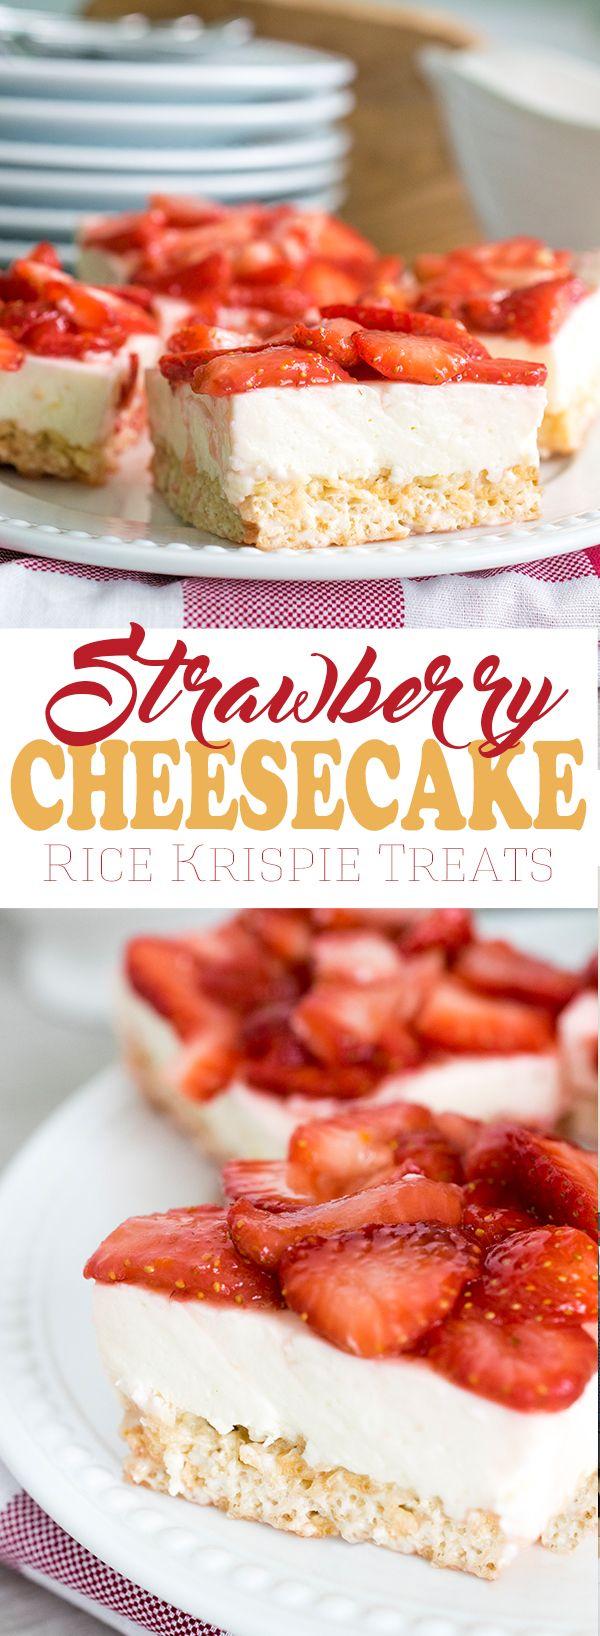 Original Rice Krispie Treats make an easy summertime dessert but strawberry cheesecake rice krispie treats are even better!